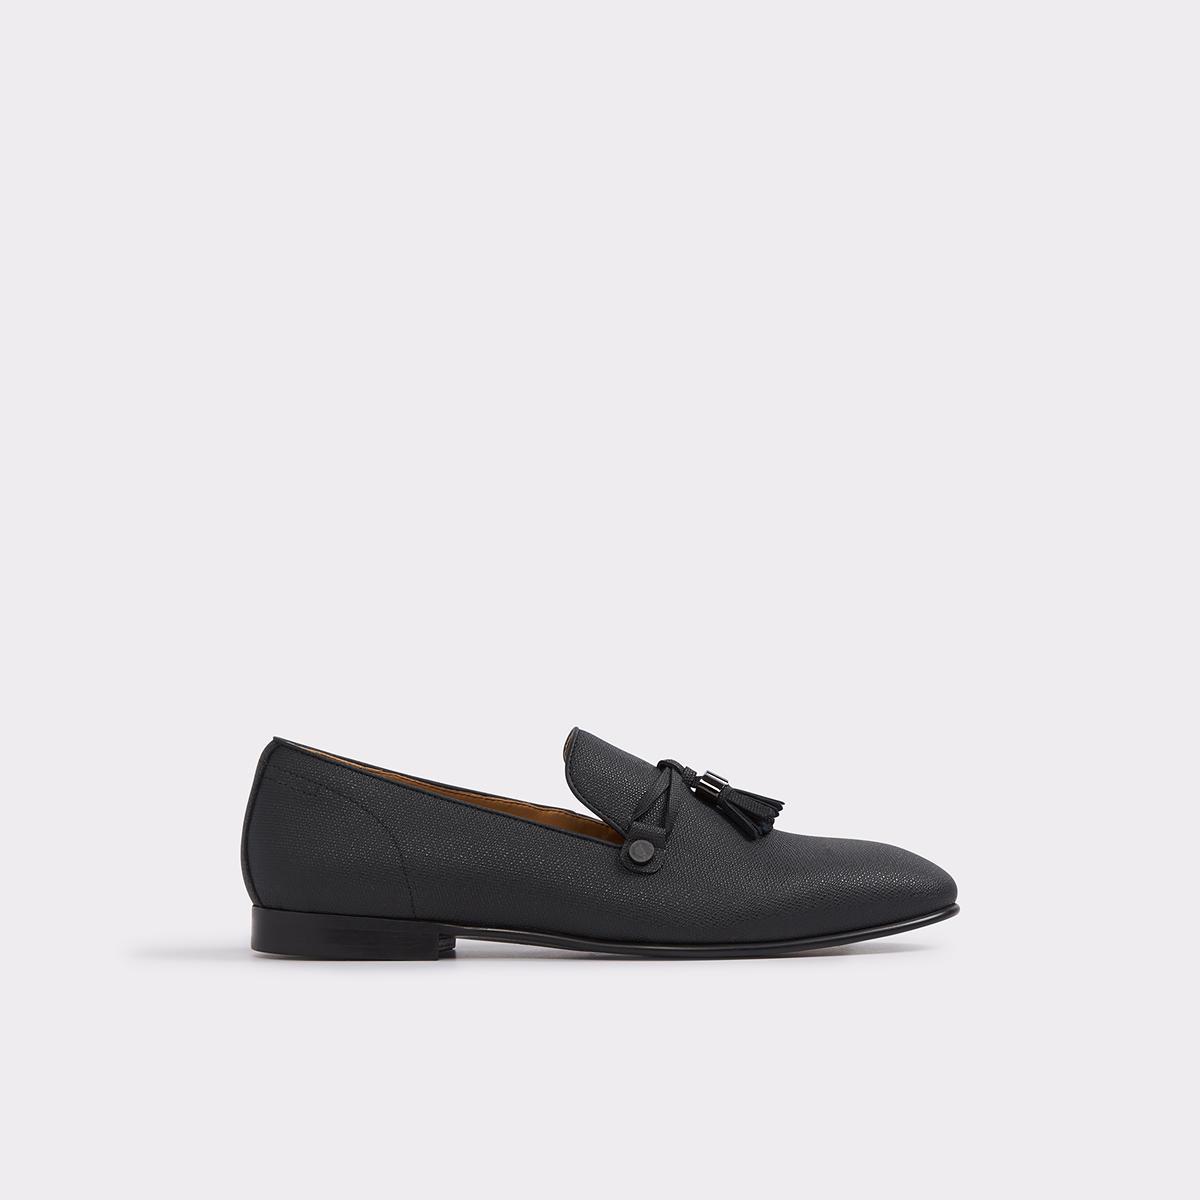 Mccrery Midnight Black Men's Loafers | ALDO US at Aldo Shoes in Victor, NY | Tuggl